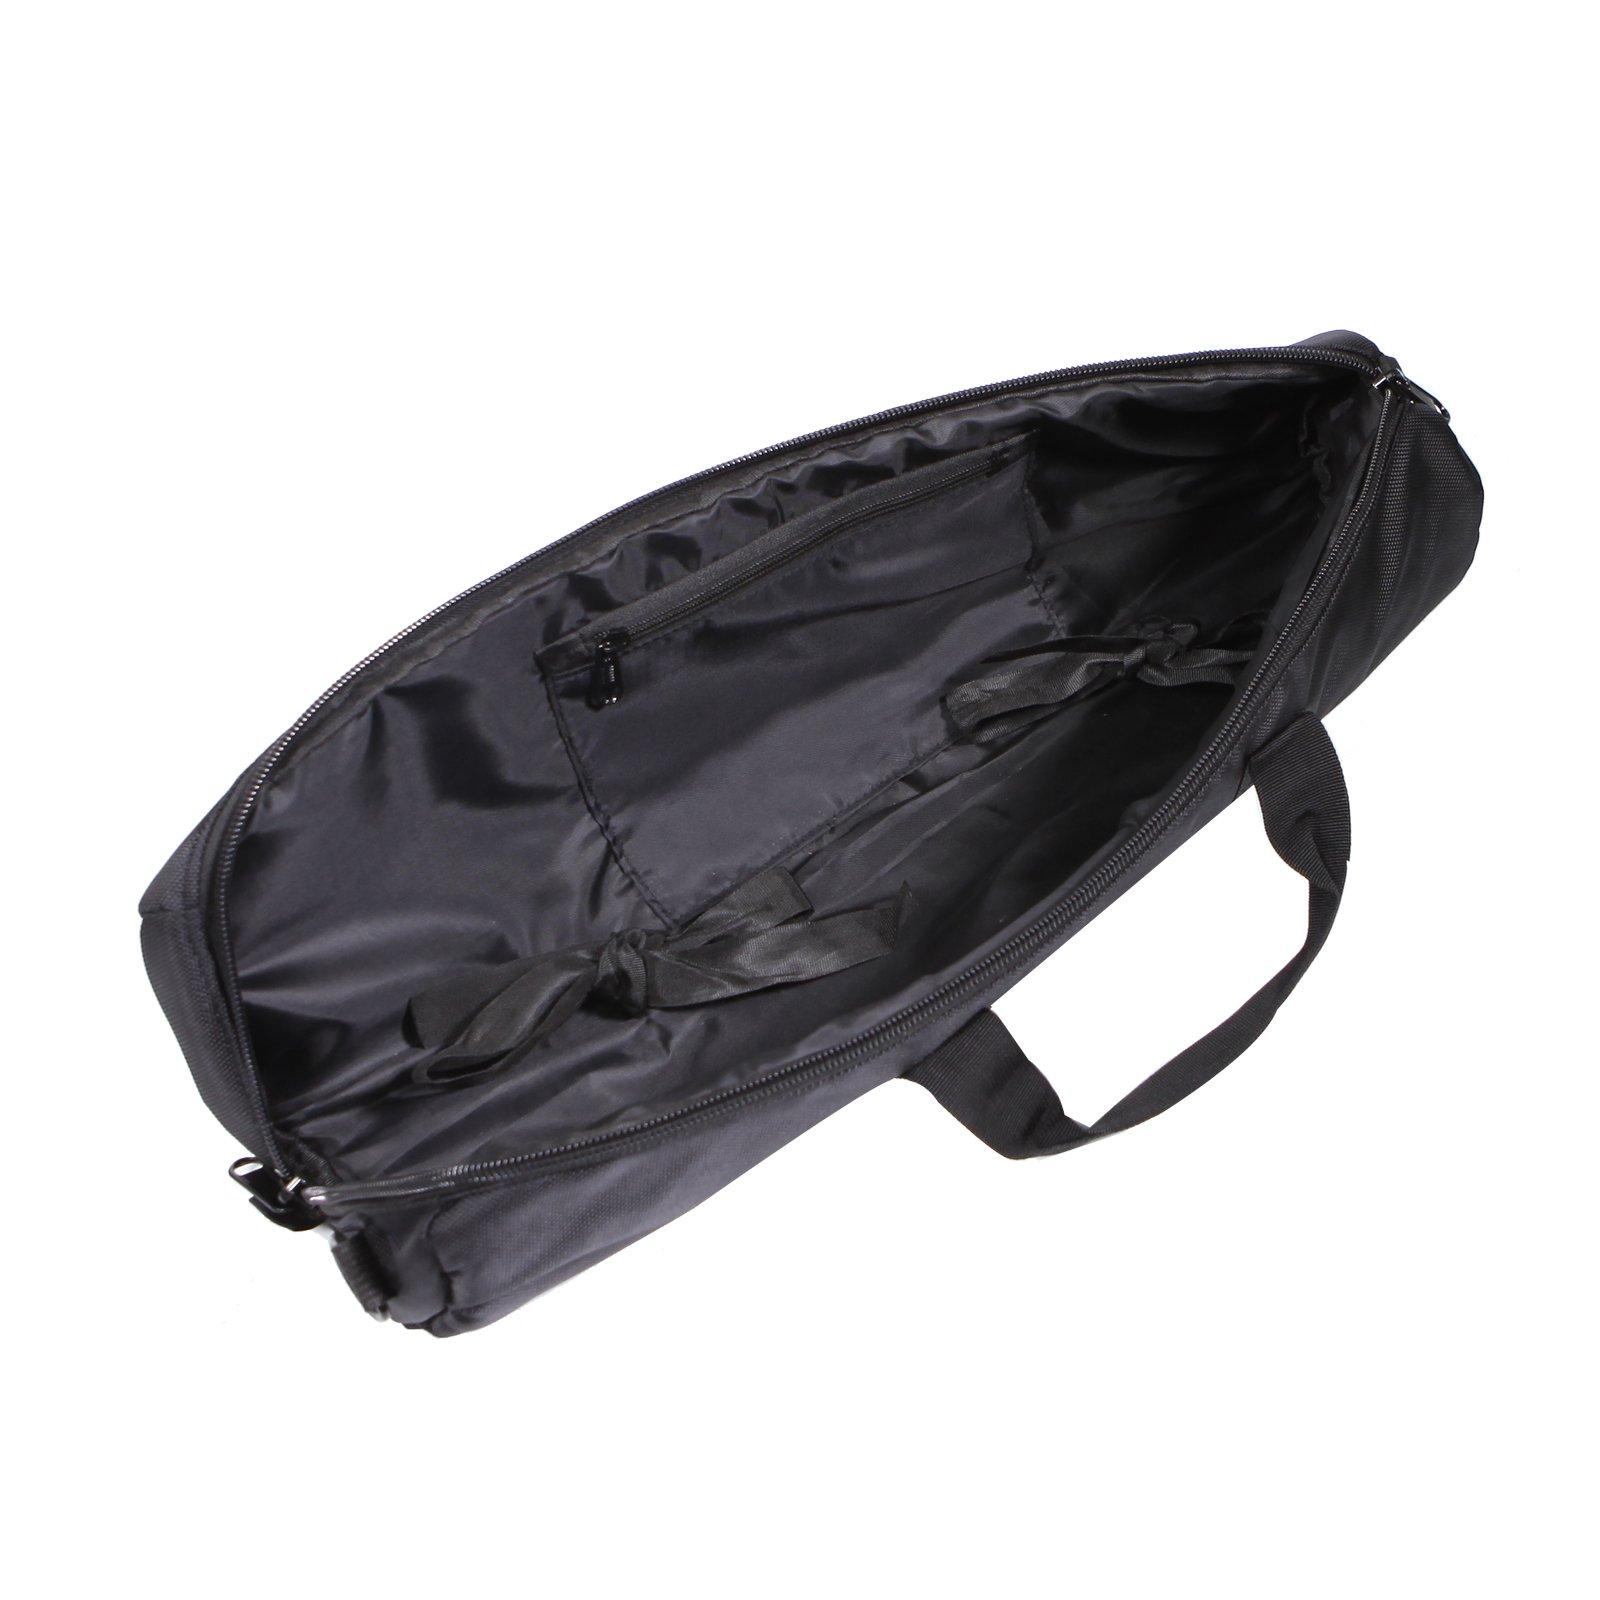 Meking 30''/75cm Padded Tripod Zipper Case Bag with Shoulder Strap by Meking (Image #6)